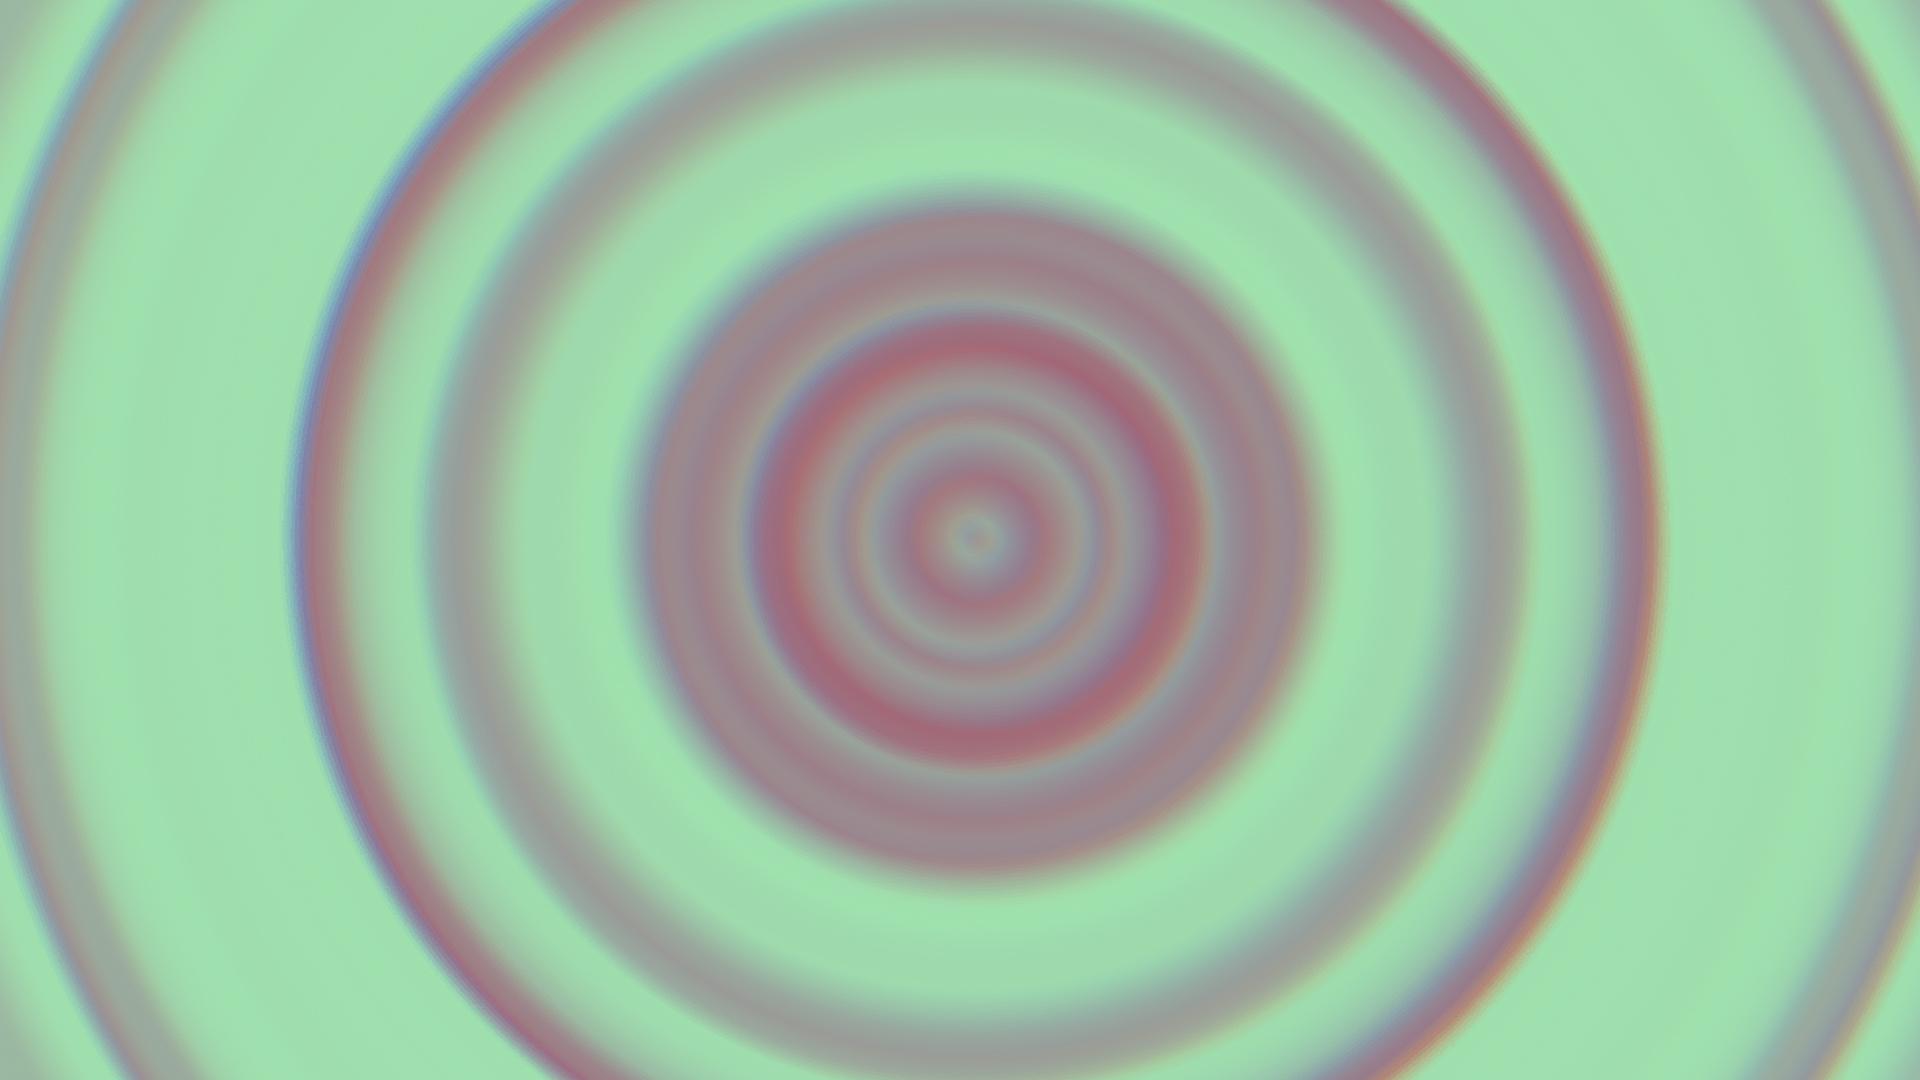 MBB pingpong (0.00.02.24).jpg